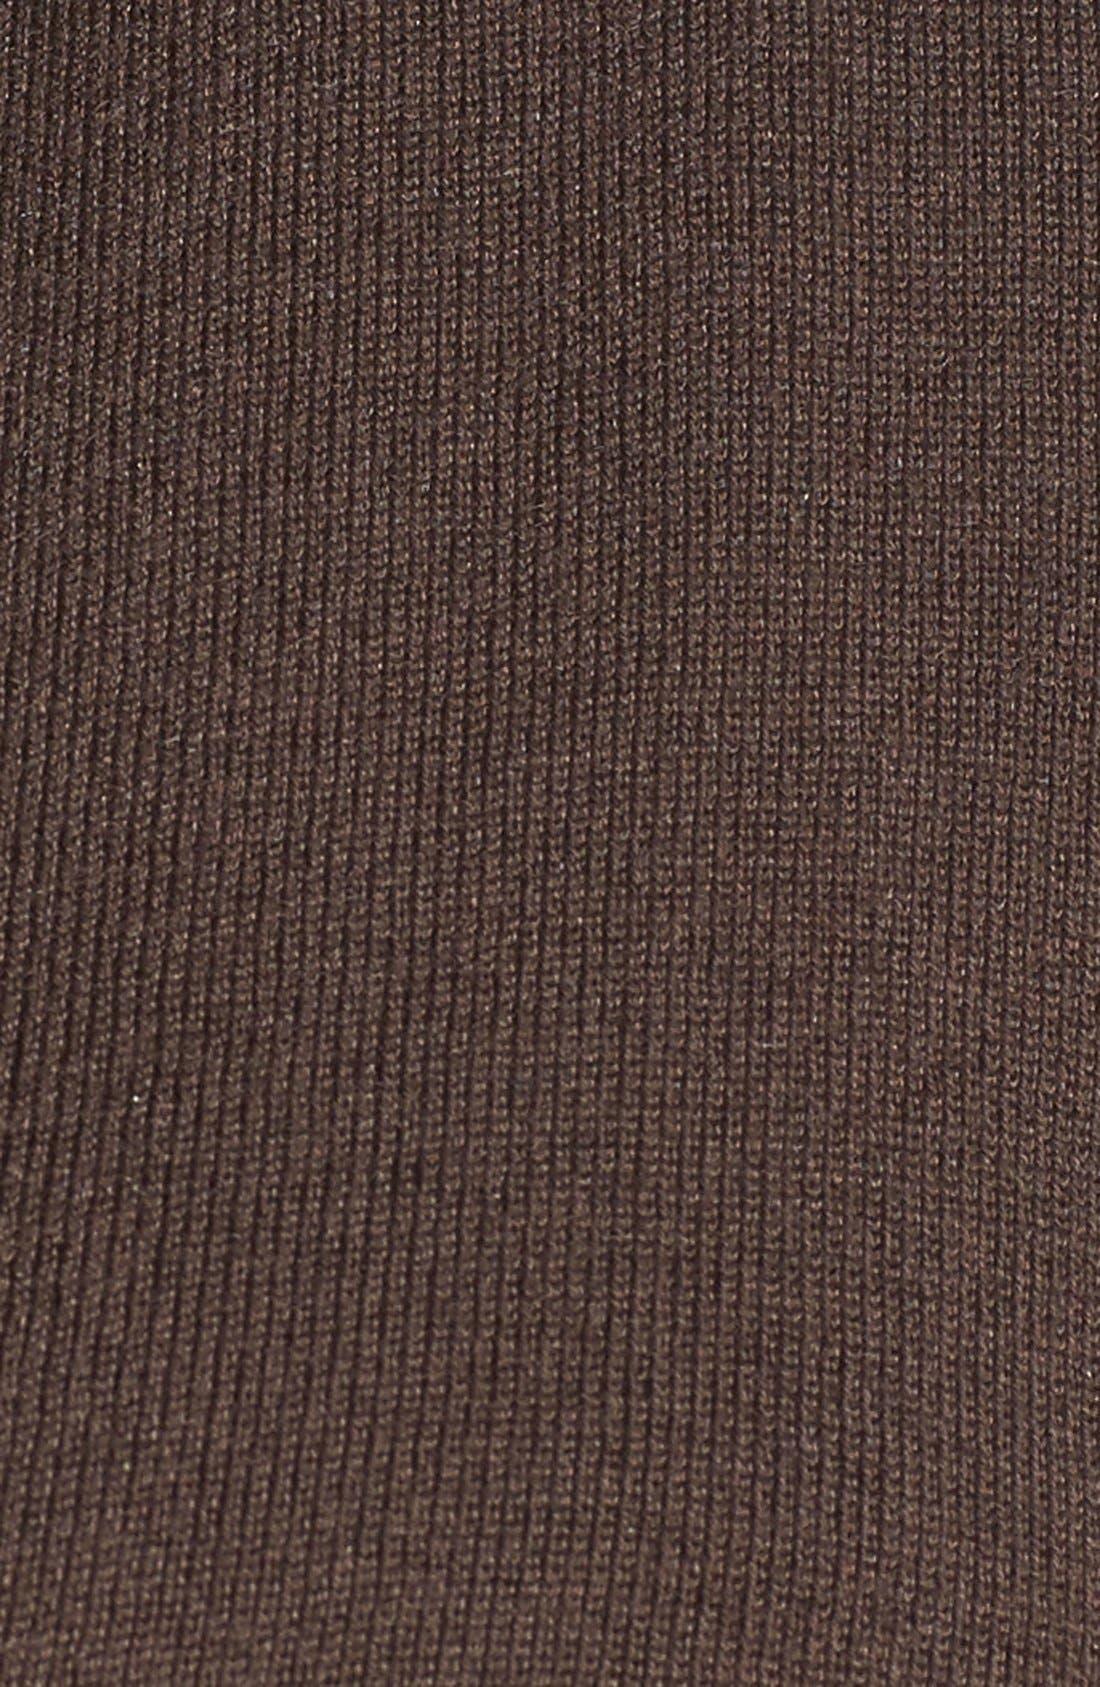 '4-Way' Three Quarter Sleeve Convertible Cardigan,                             Alternate thumbnail 5, color,                             River Rock